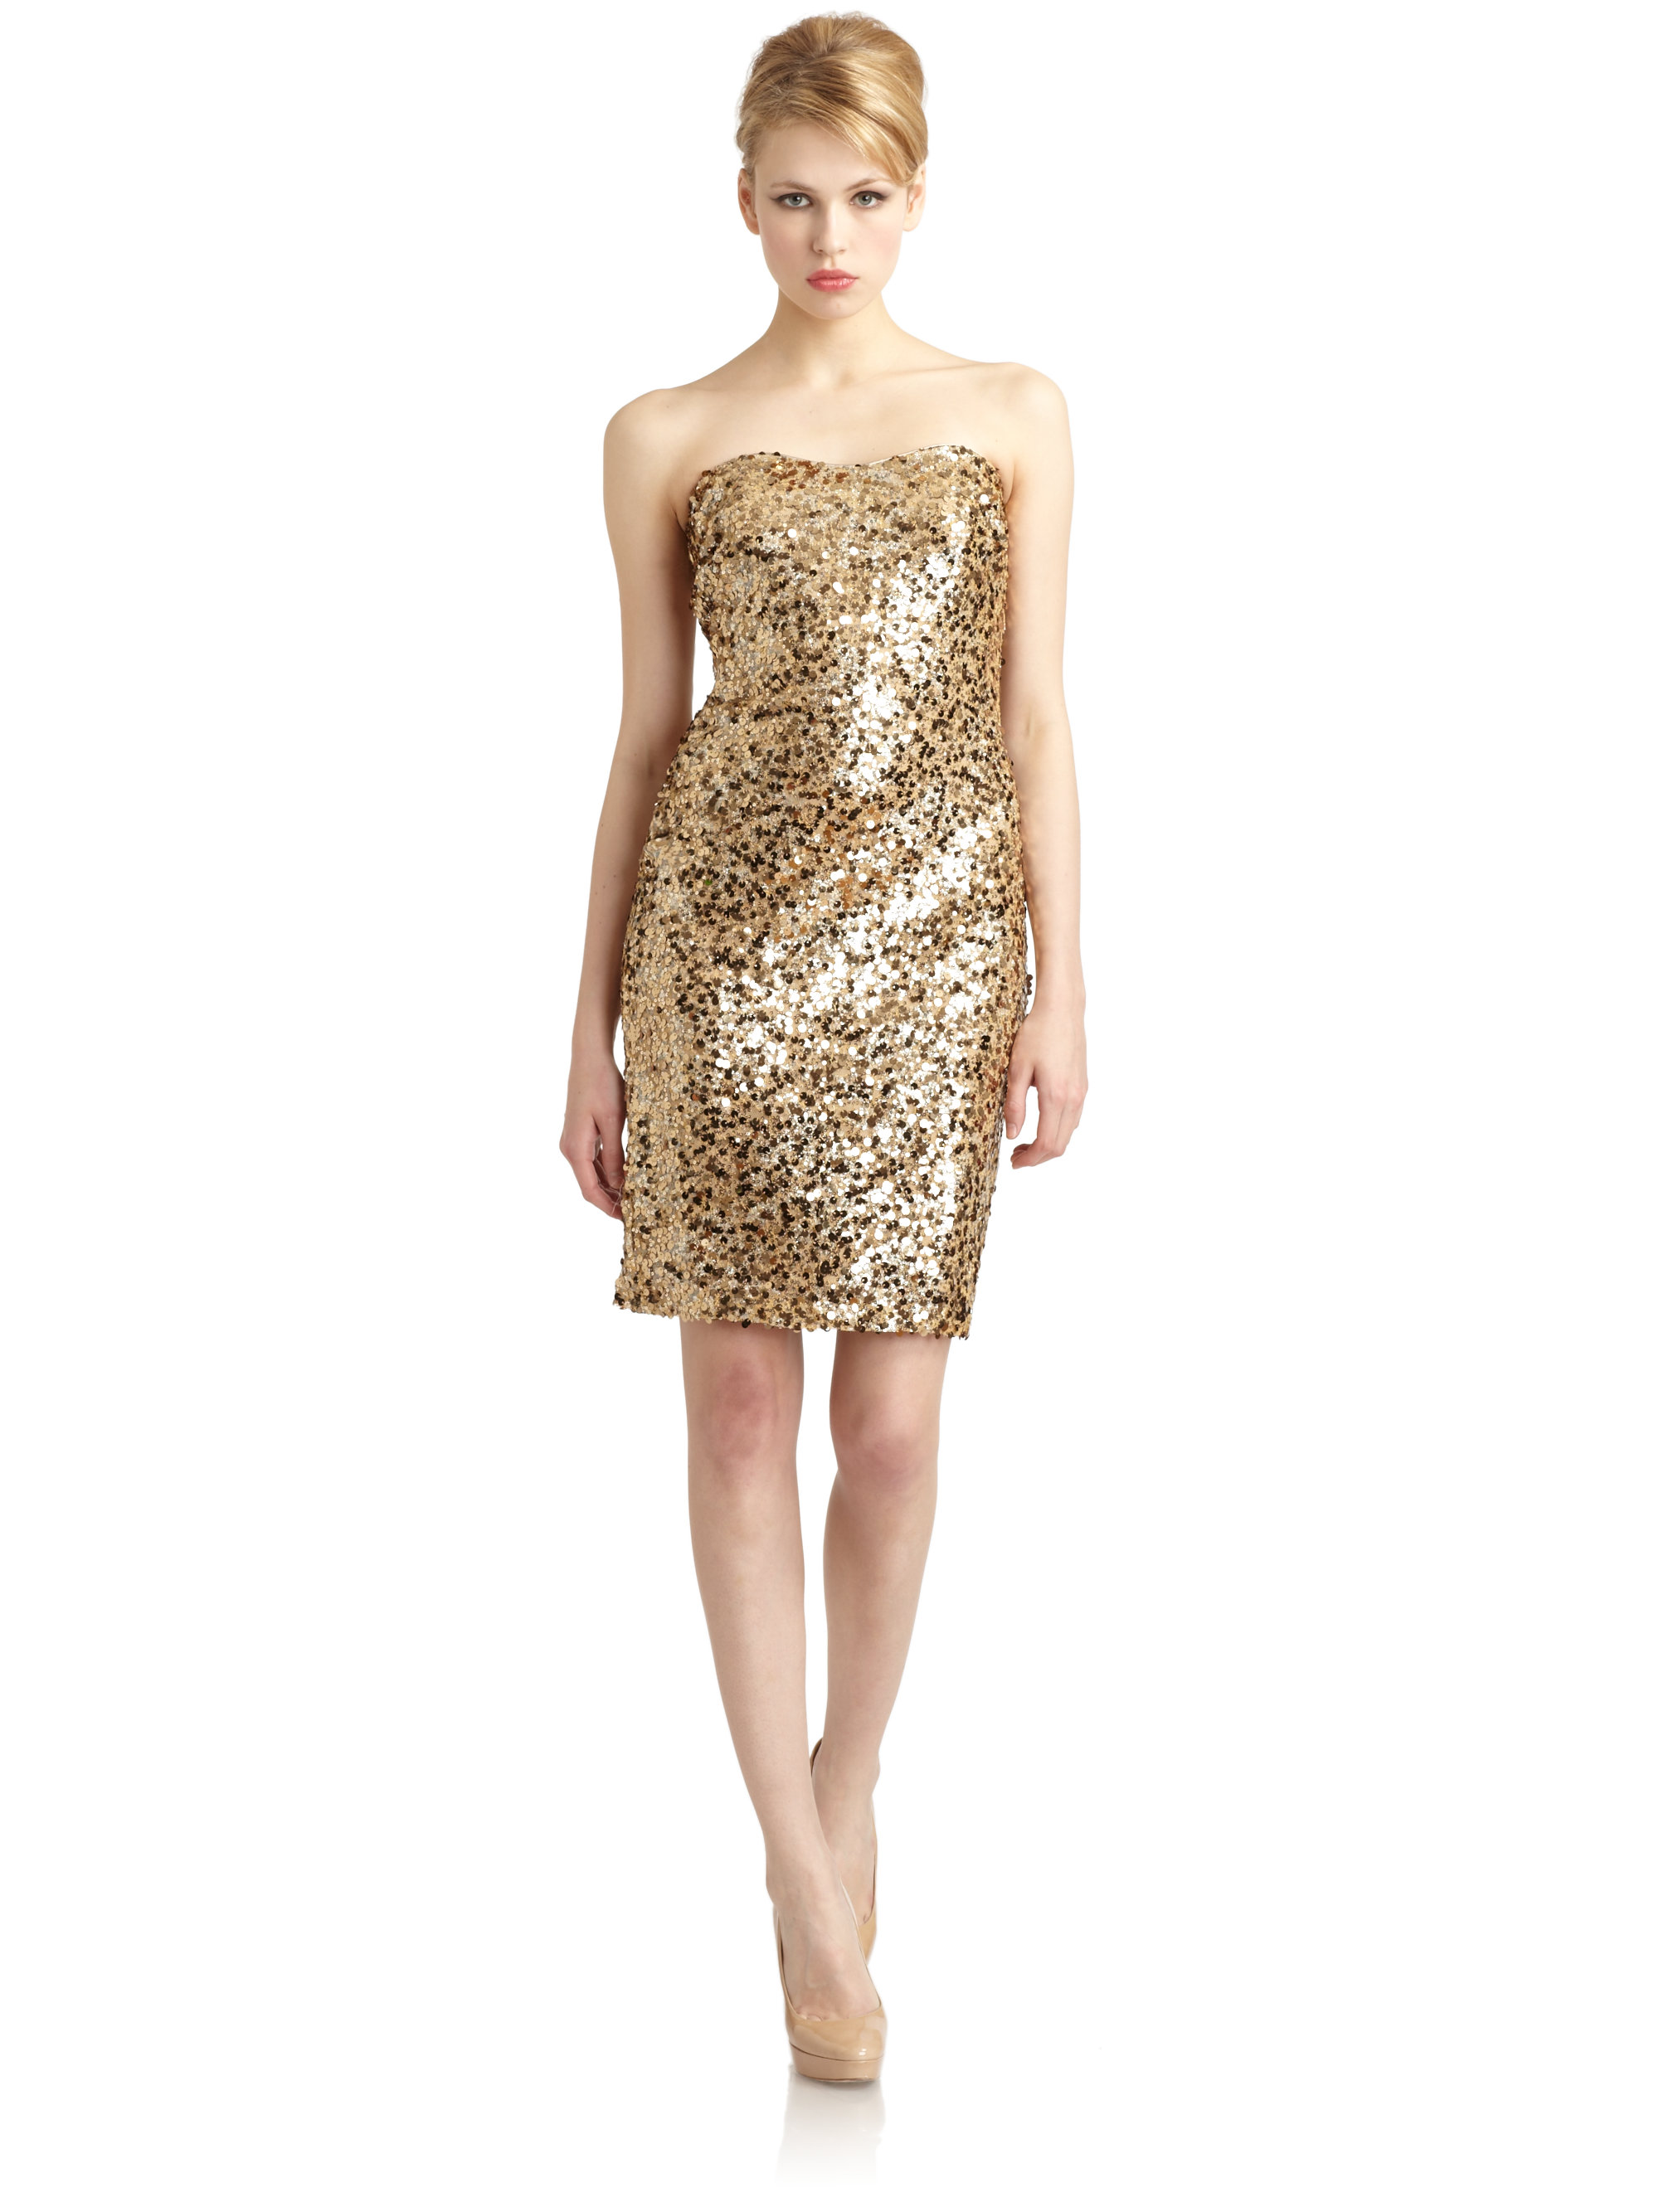 Gold Sequin Strapless Dress